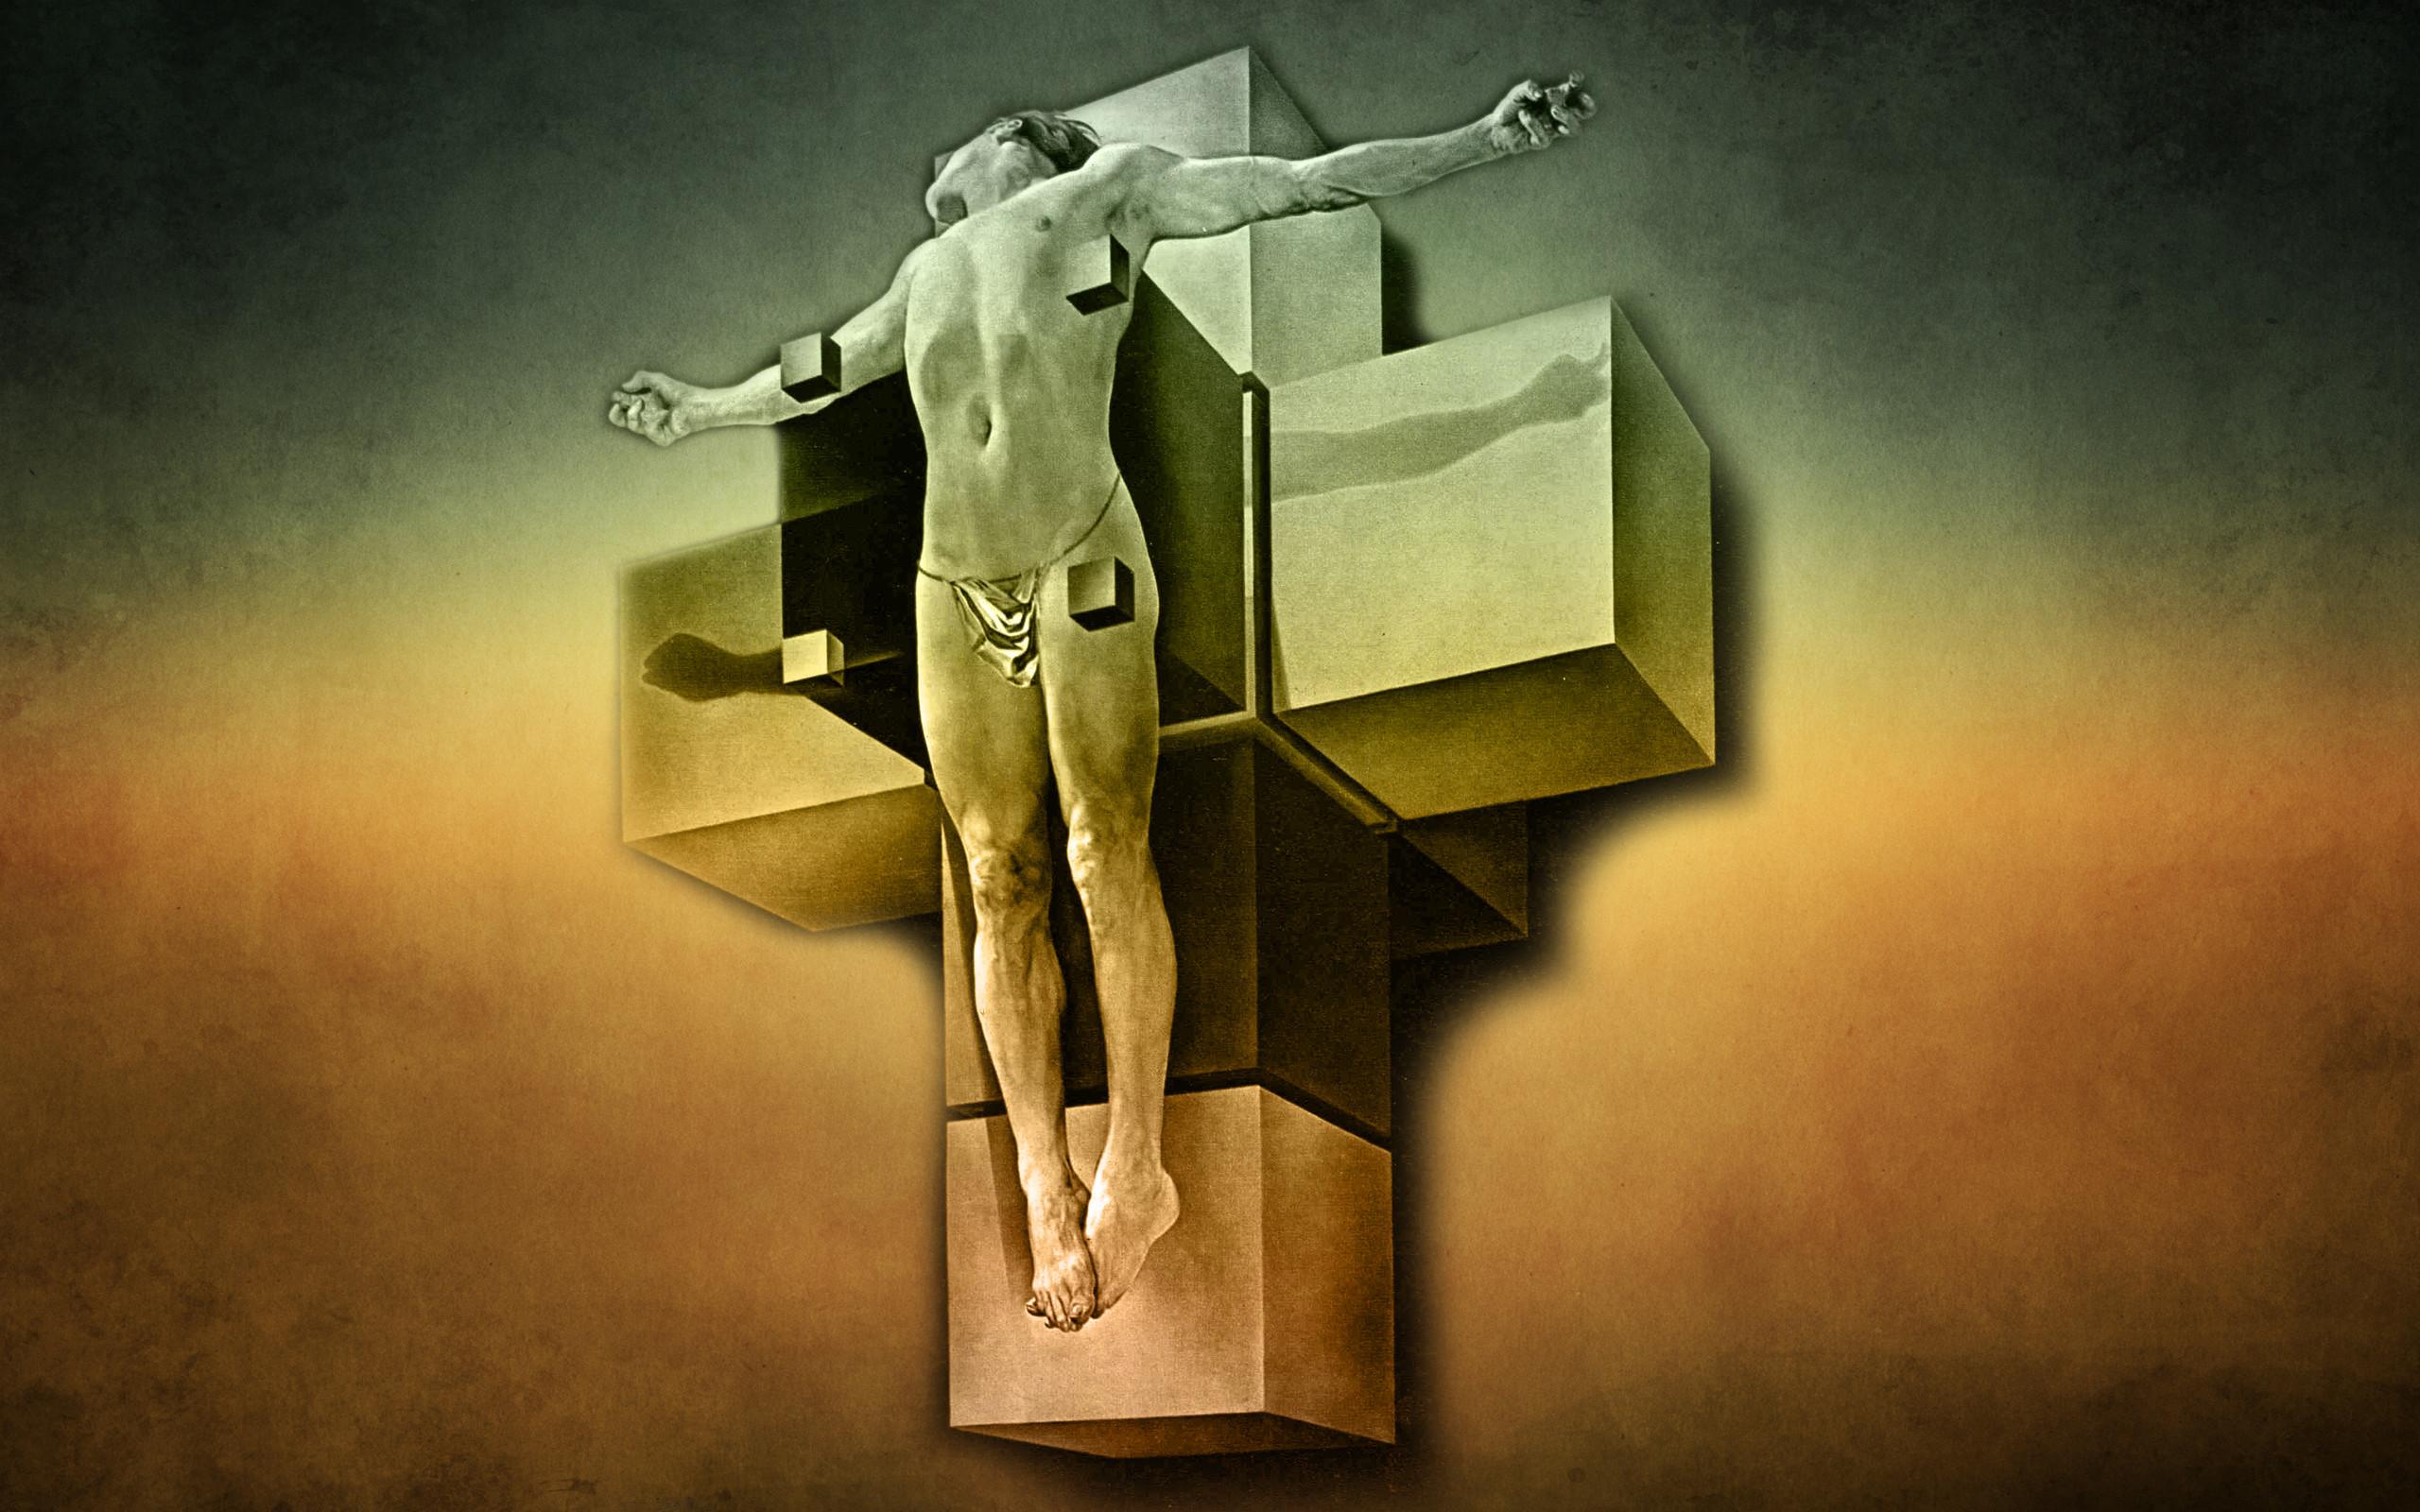 salvador dal artwork corpus hypercubus dali HD Wallpaper – General .